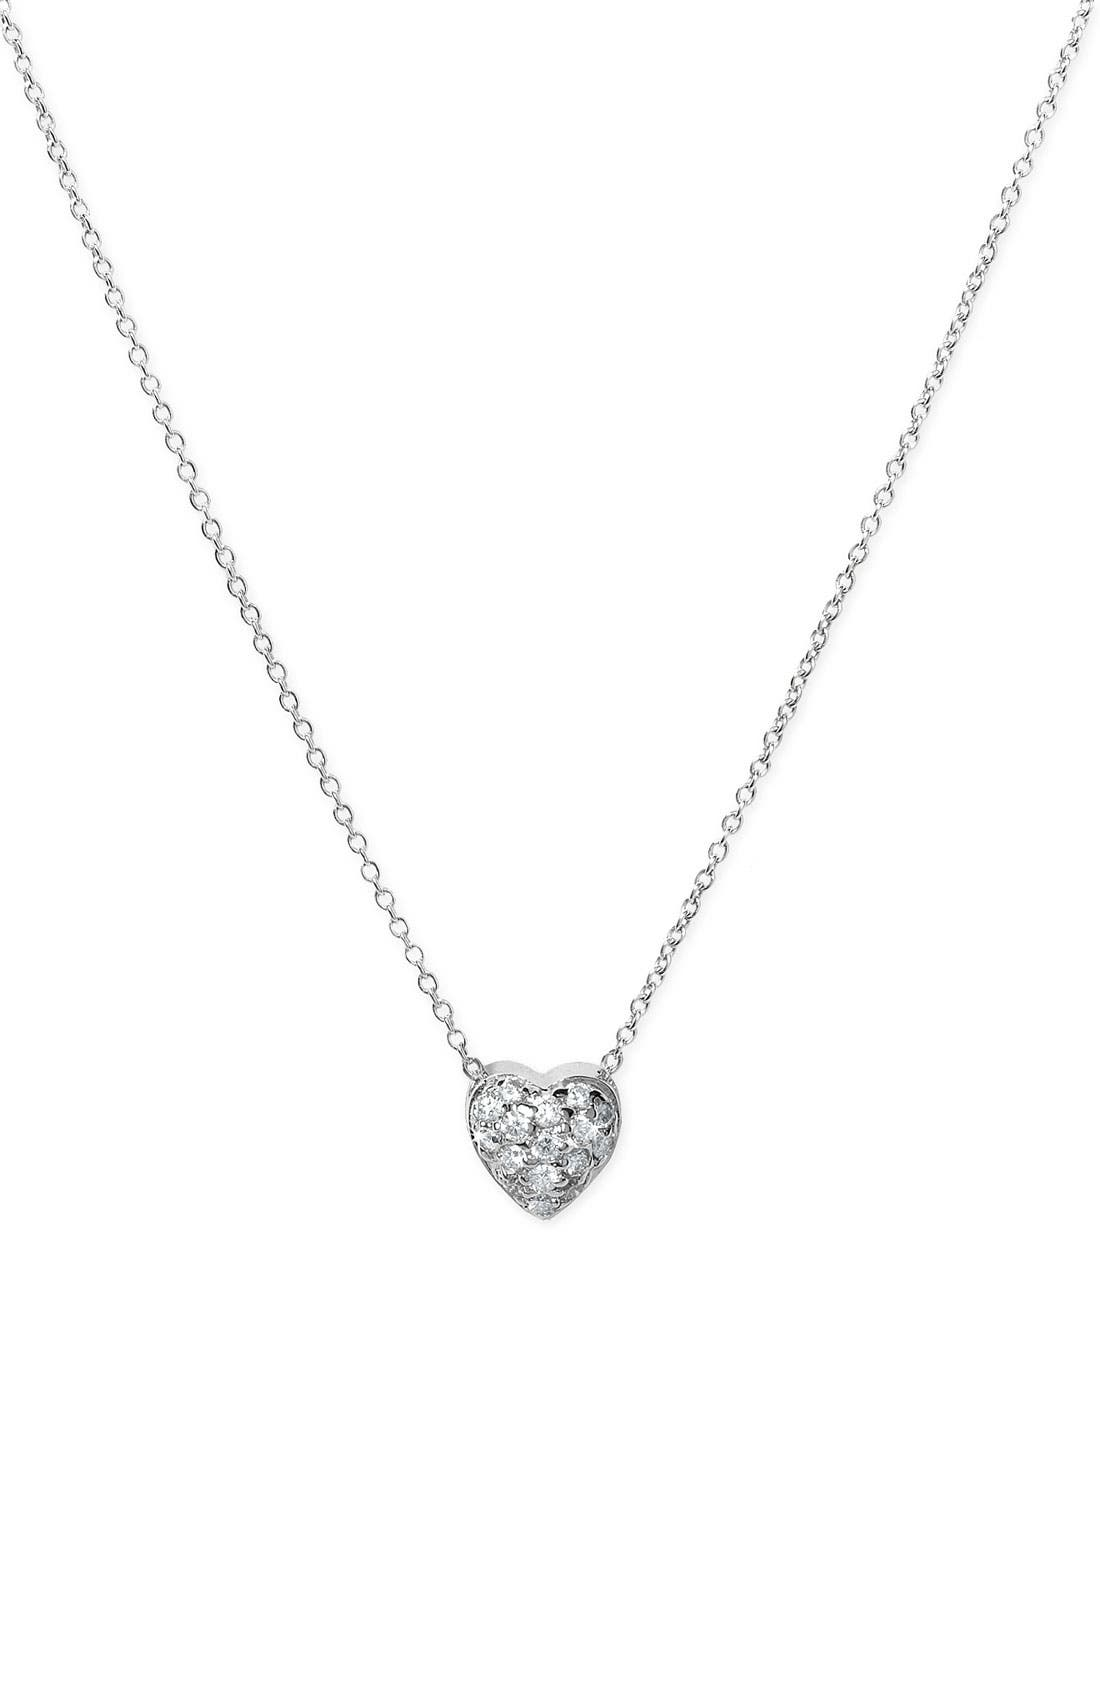 Roberto Coin 'Tiny Treasures' Diamond Puffed Heart Pendant Necklace